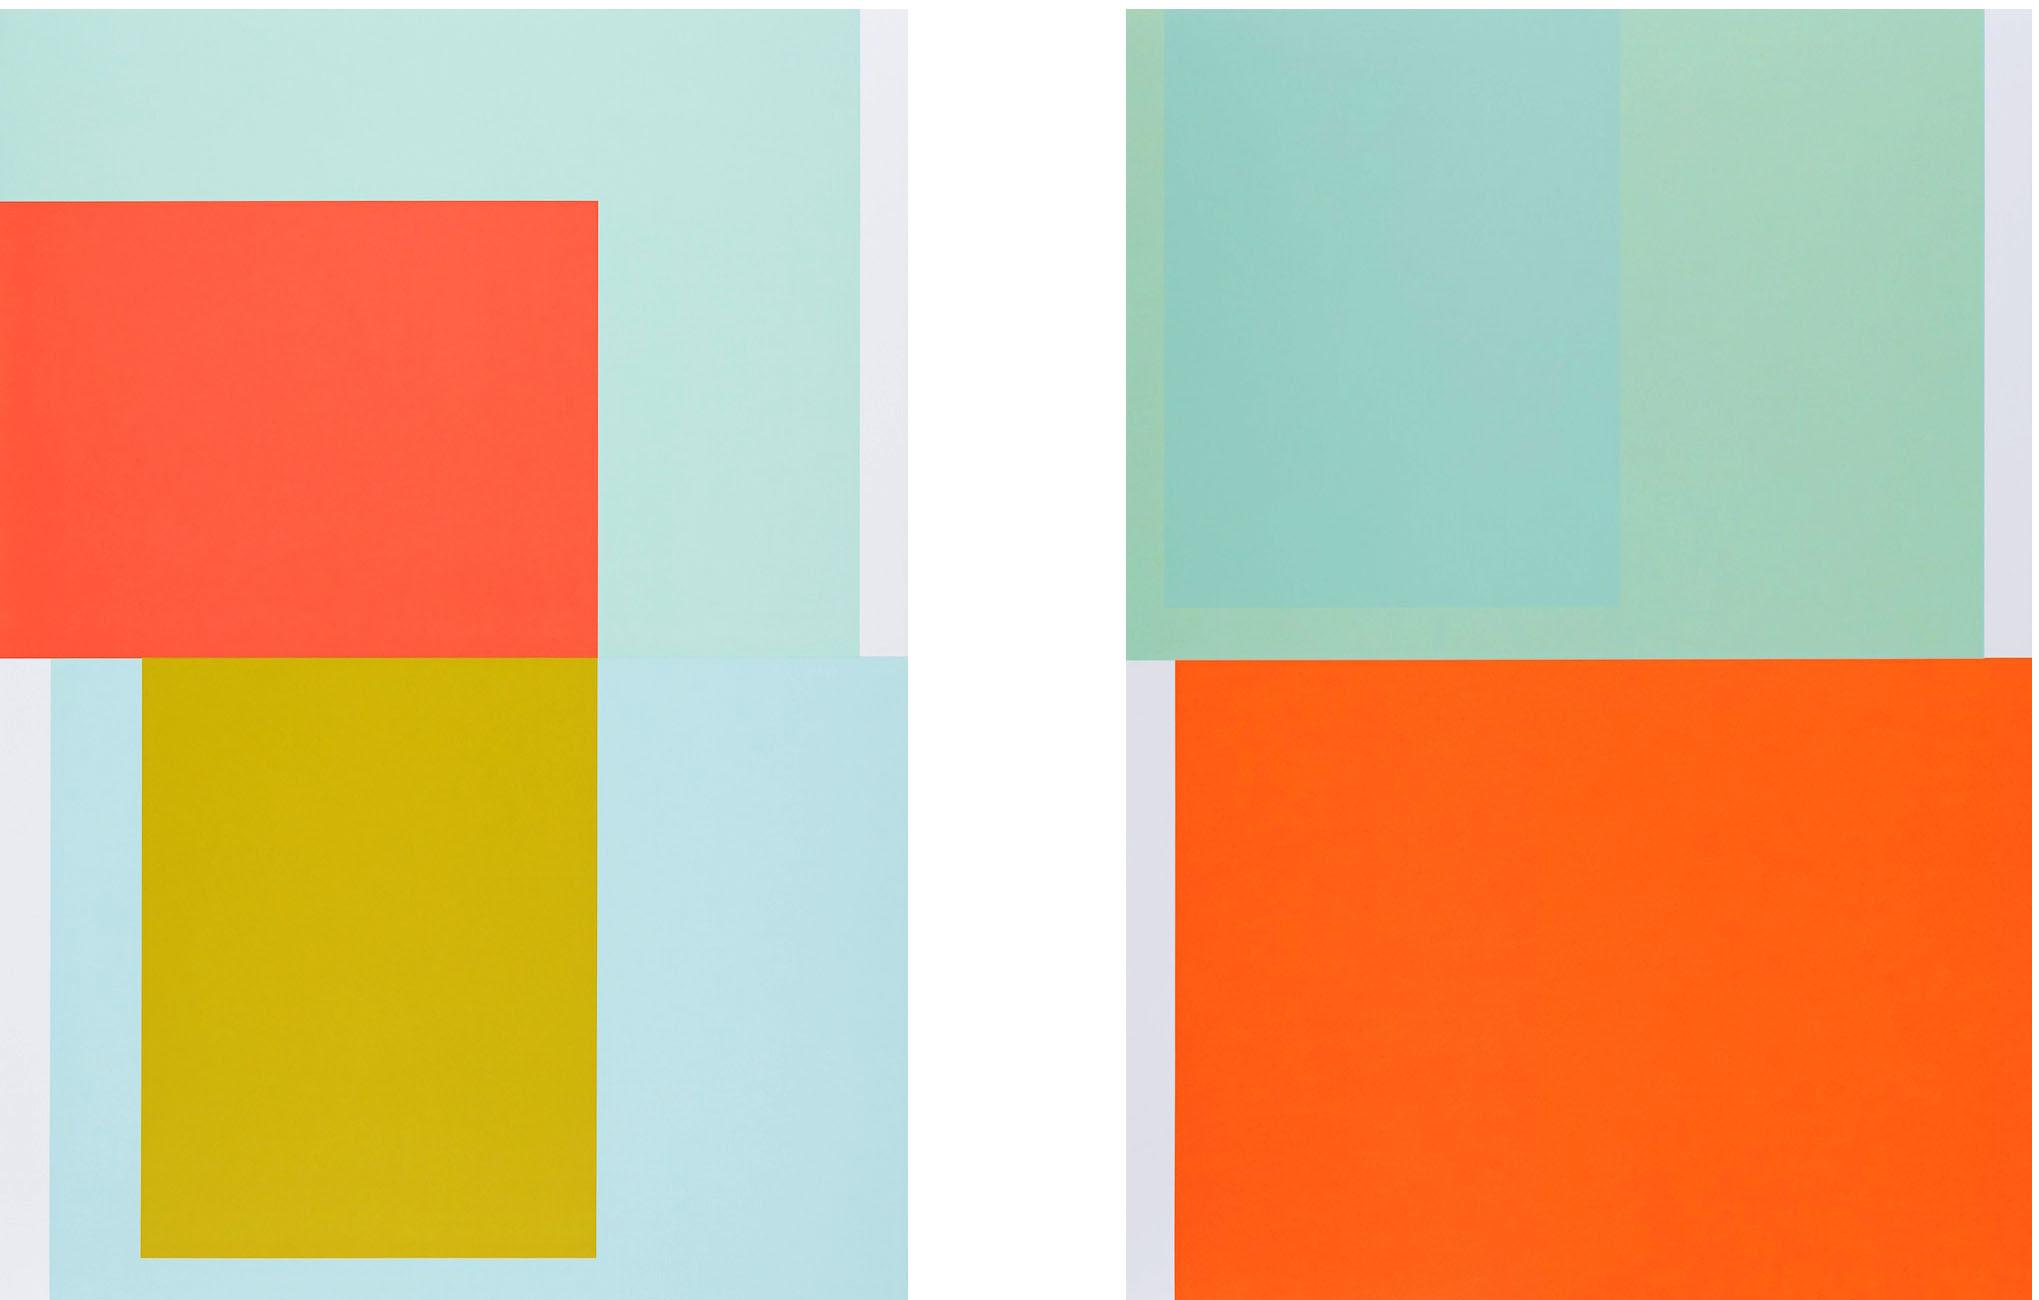 Collecting Colors (Red / Yellow) (Green/Orange), 2016. Silkscreen print 100 x 70 cm. Ed. 4